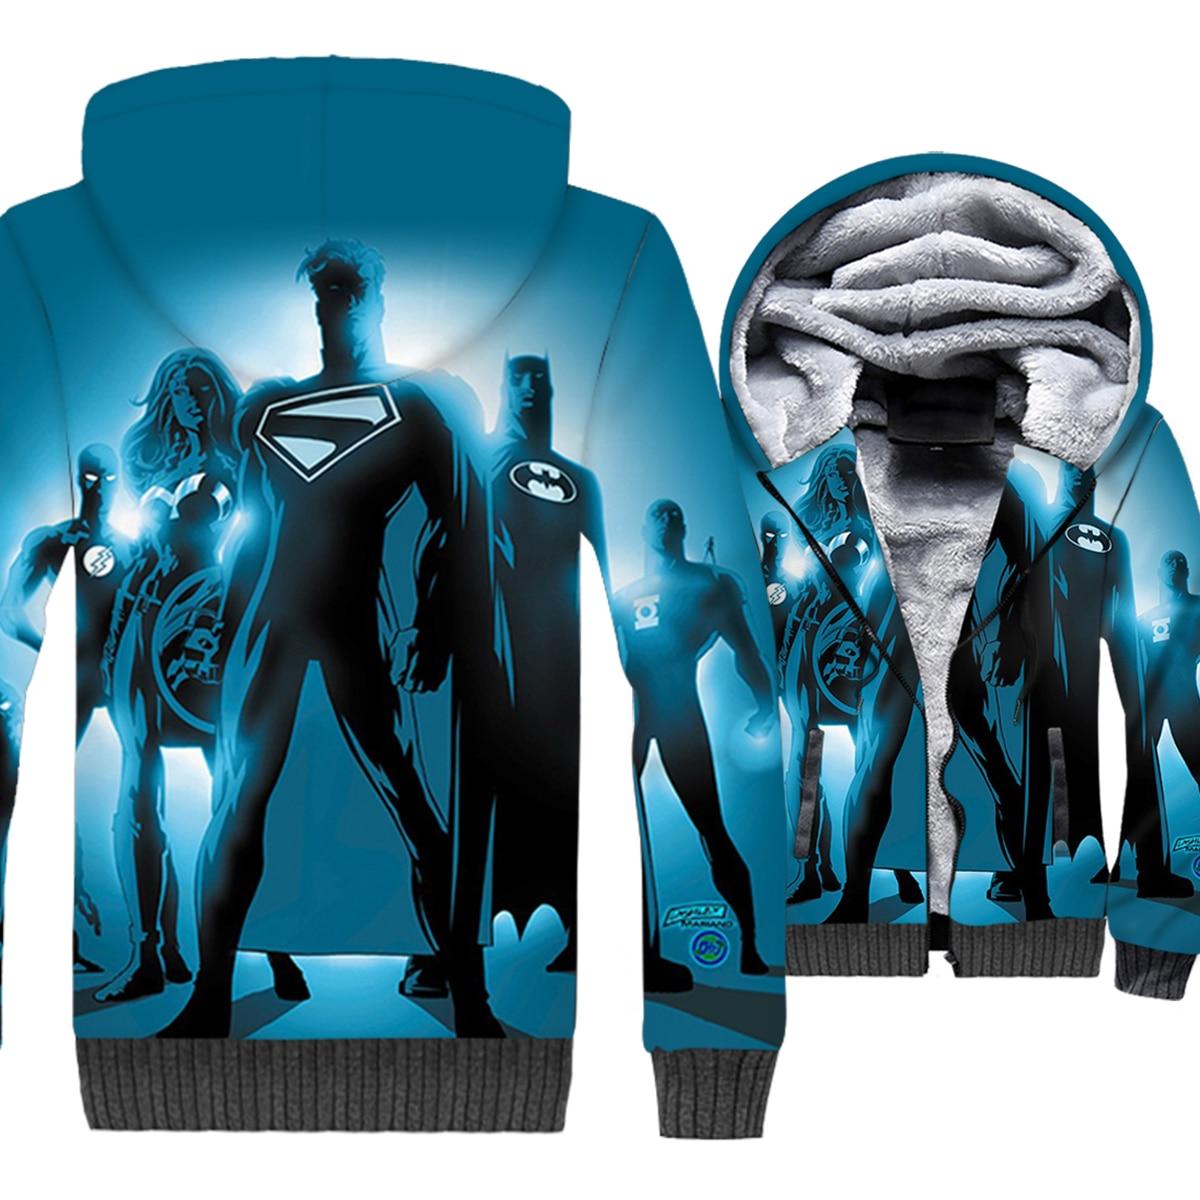 Superhero Sweatshirt 2019 Winter Thick Jacket Hip Hop Men 39 s Zipper Coat Long Sleeve Anime Hoodies Harajuku Unisex Tracksuits Top in Hoodies amp Sweatshirts from Men 39 s Clothing